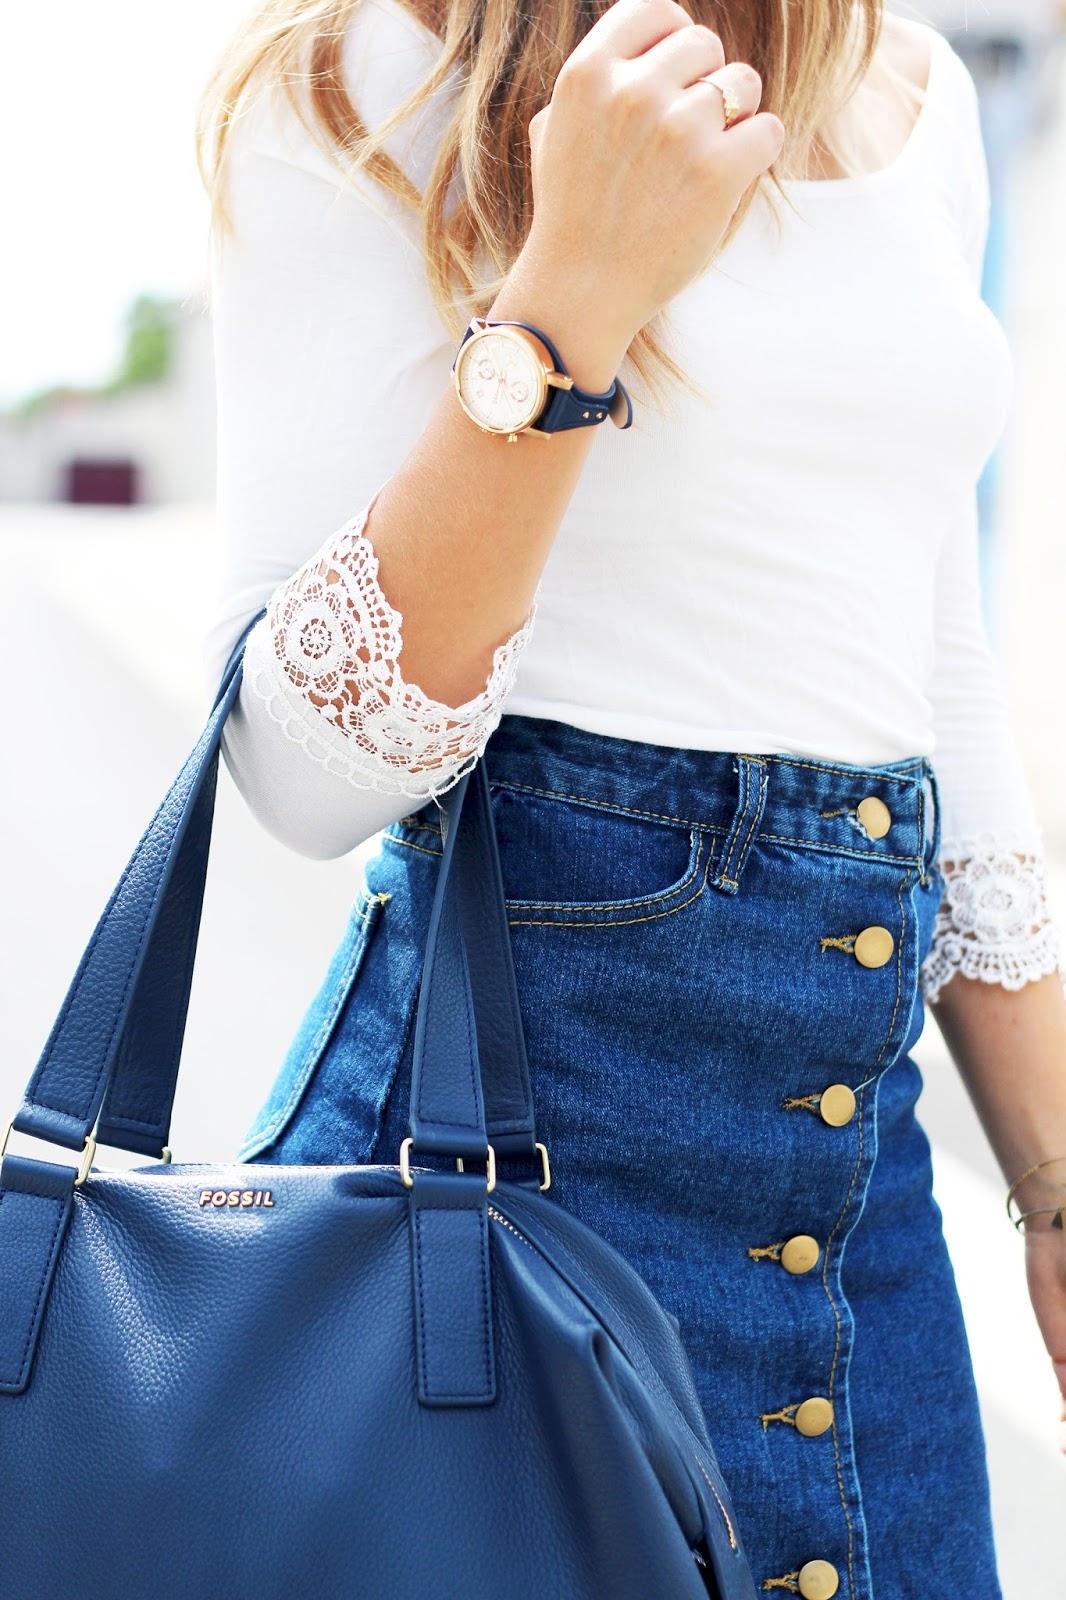 Blog mode tendance bleu jean rentrée